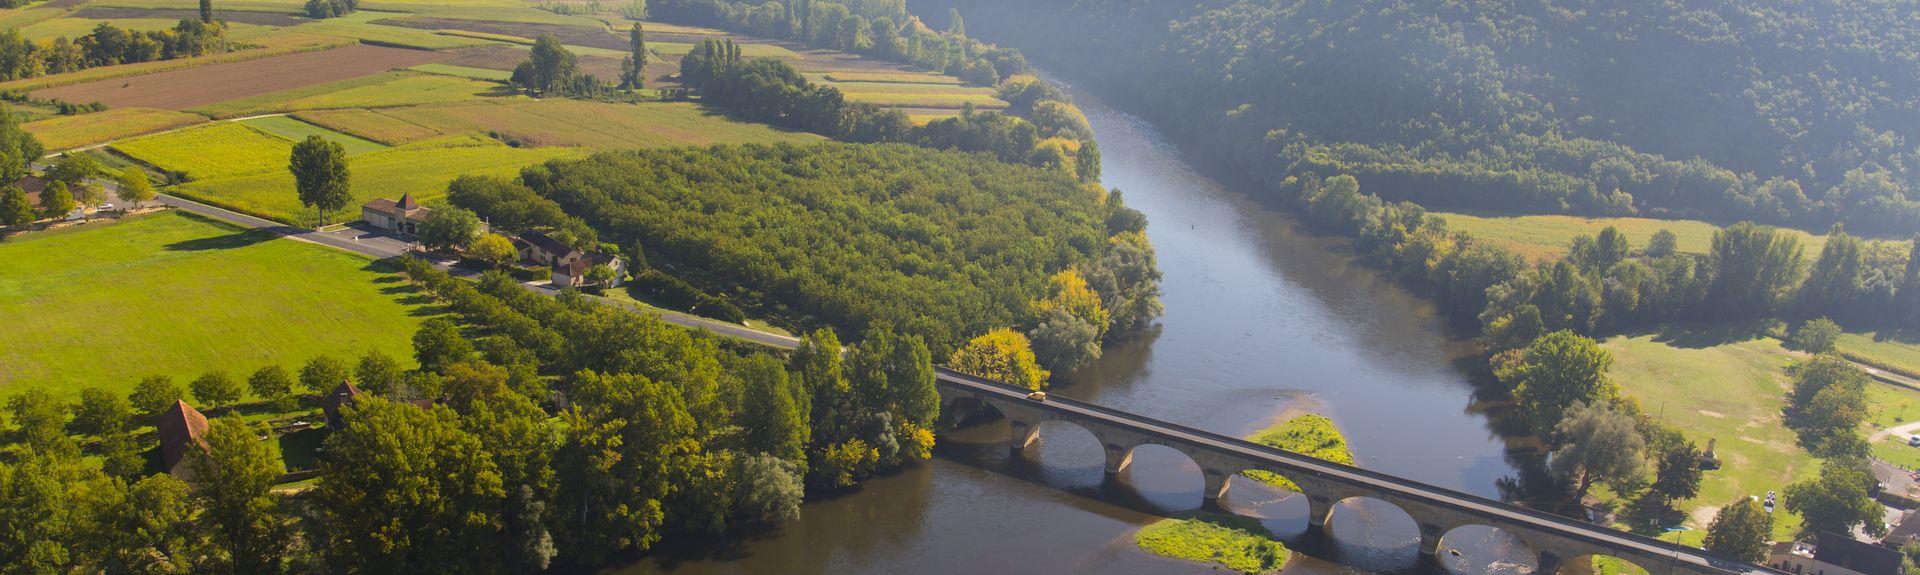 Larzac, Dordogne, France